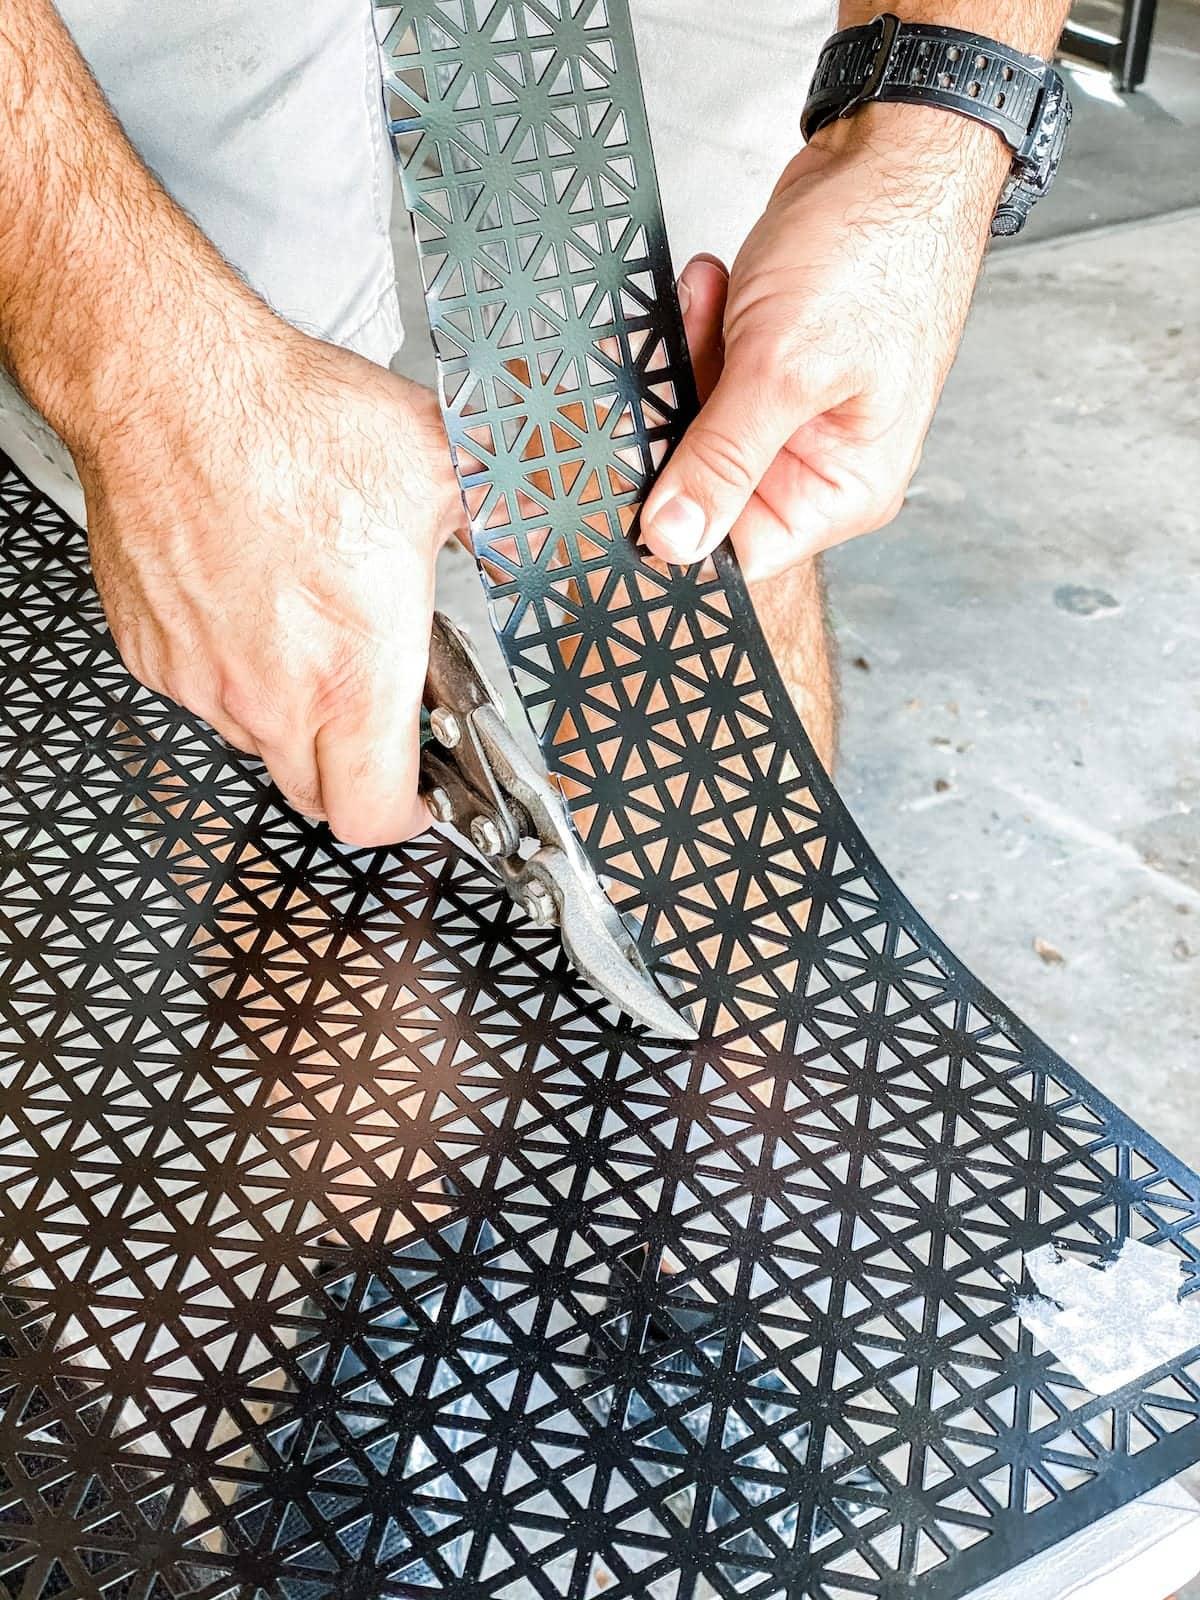 DIY vent cover using decorative sheet metal